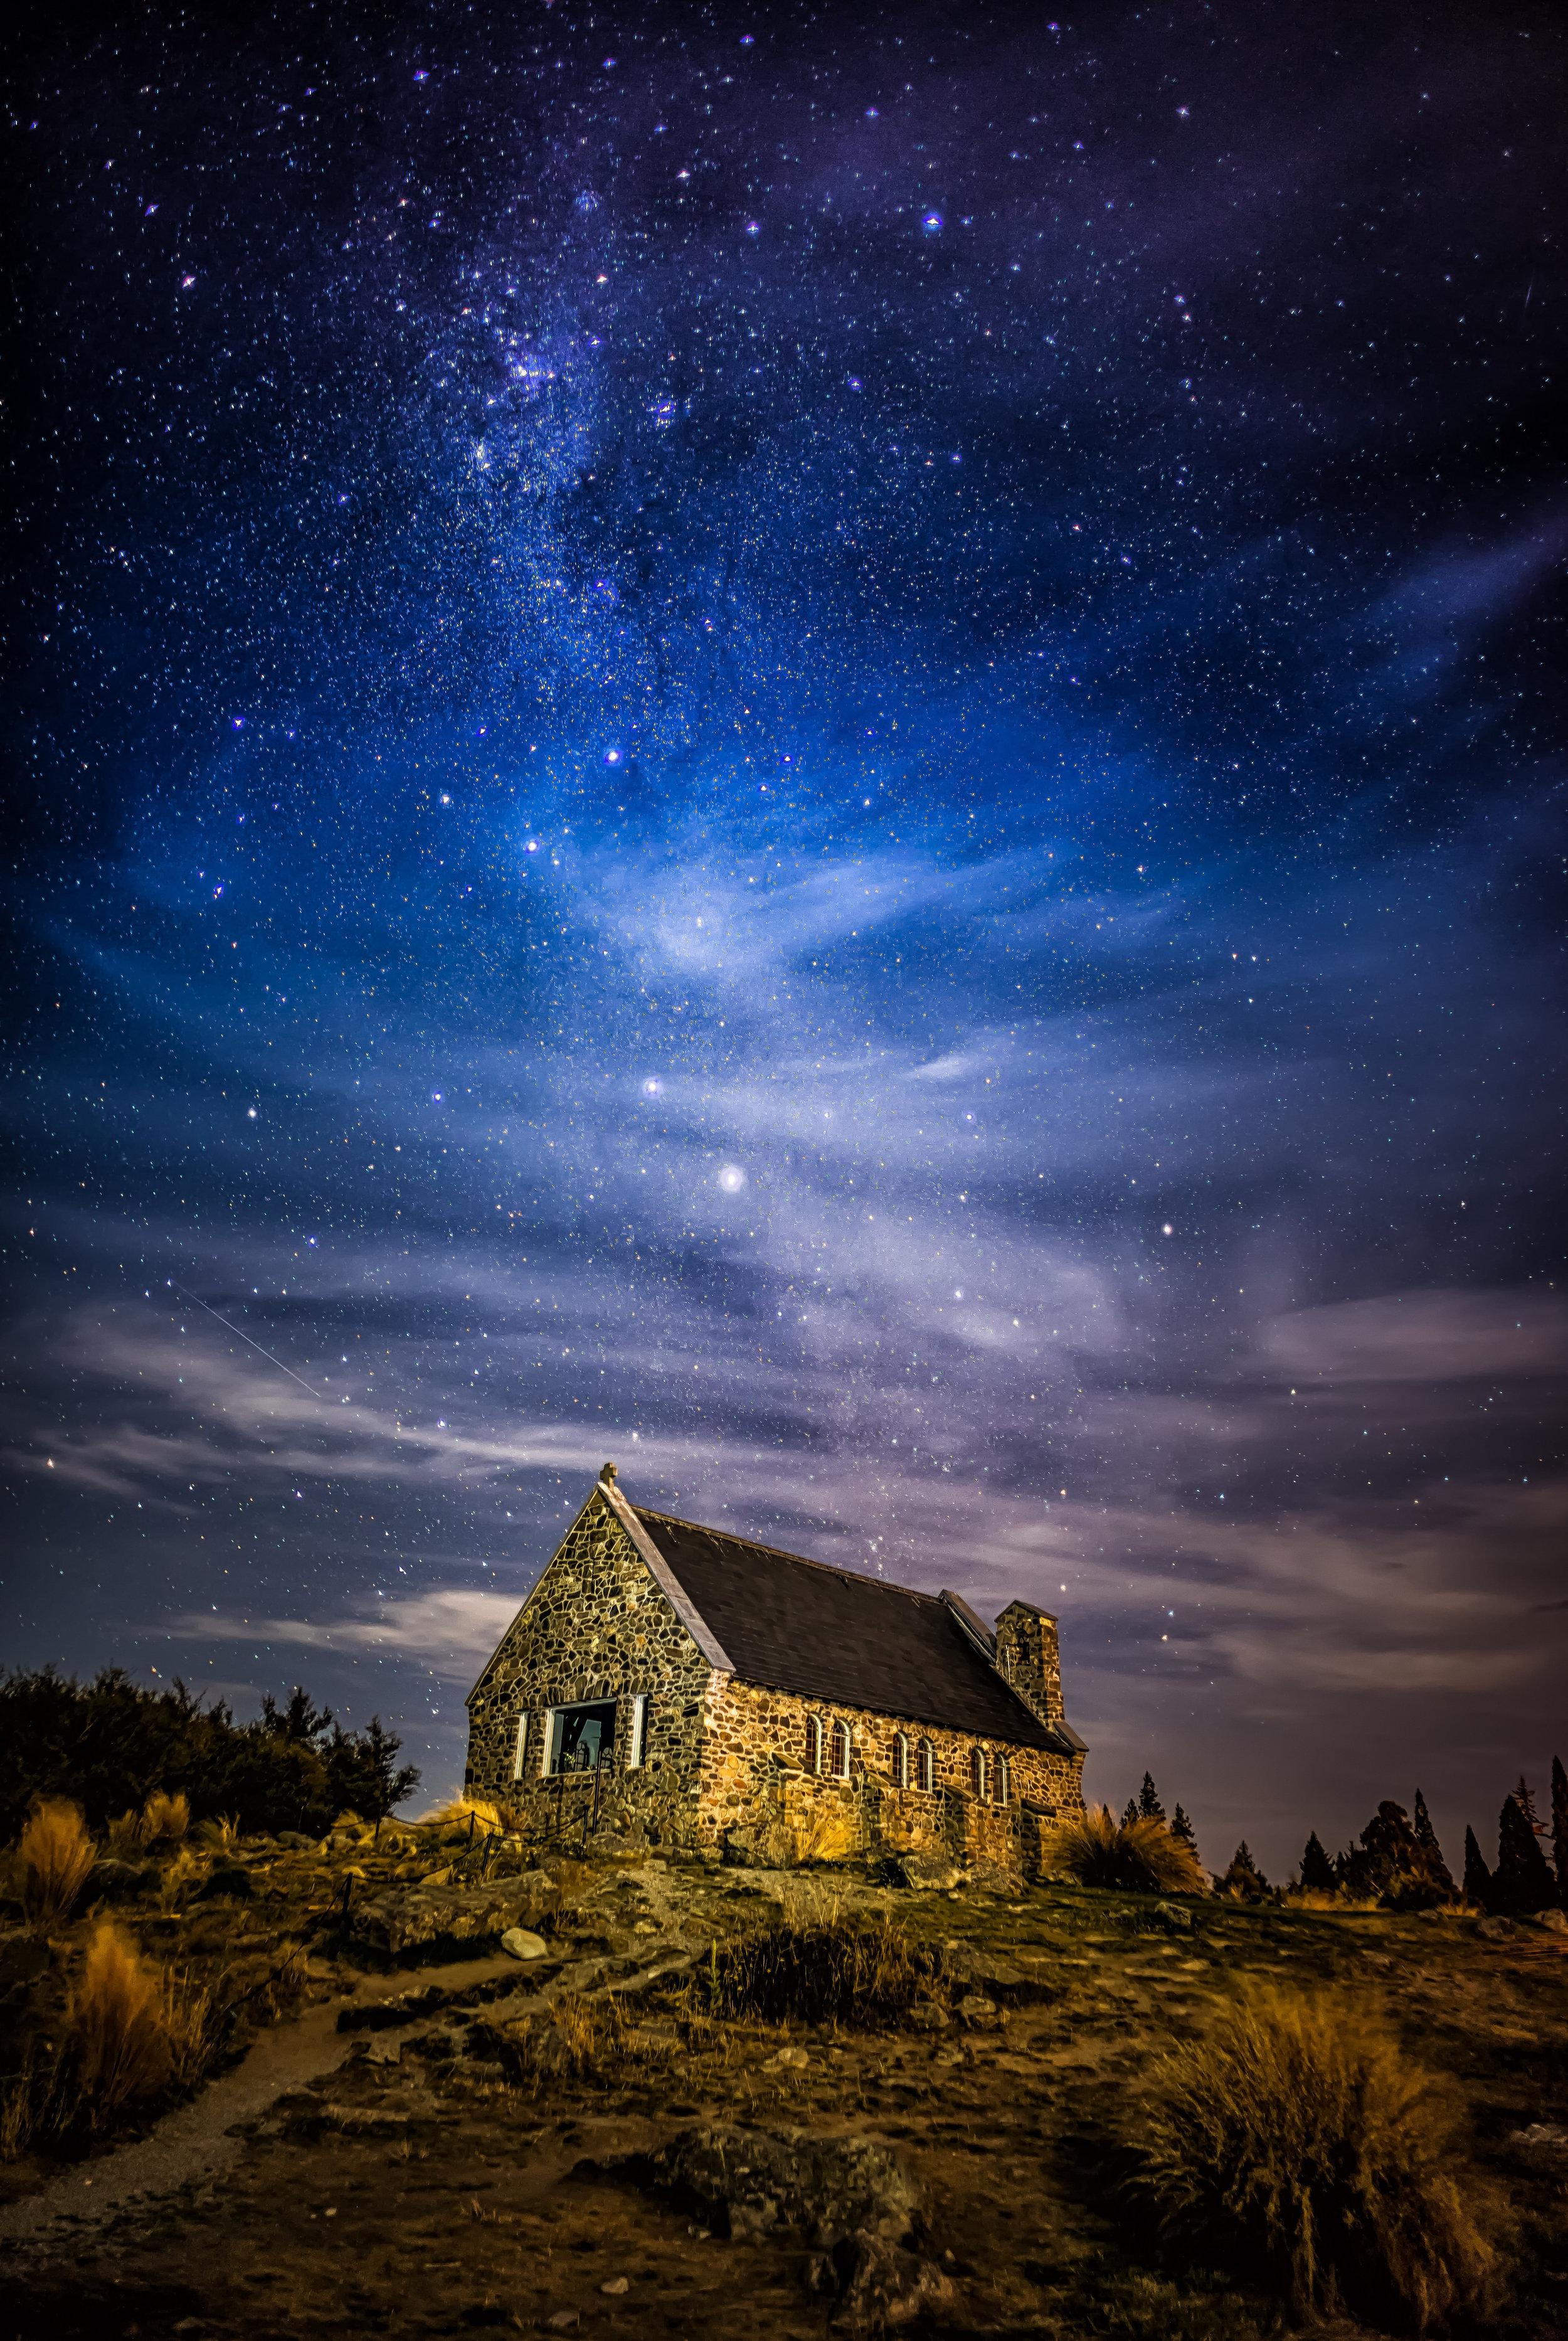 Chruch of the Good Shepherd - Lake Tekapo New Zealand-4912 x 7360-2.jpg